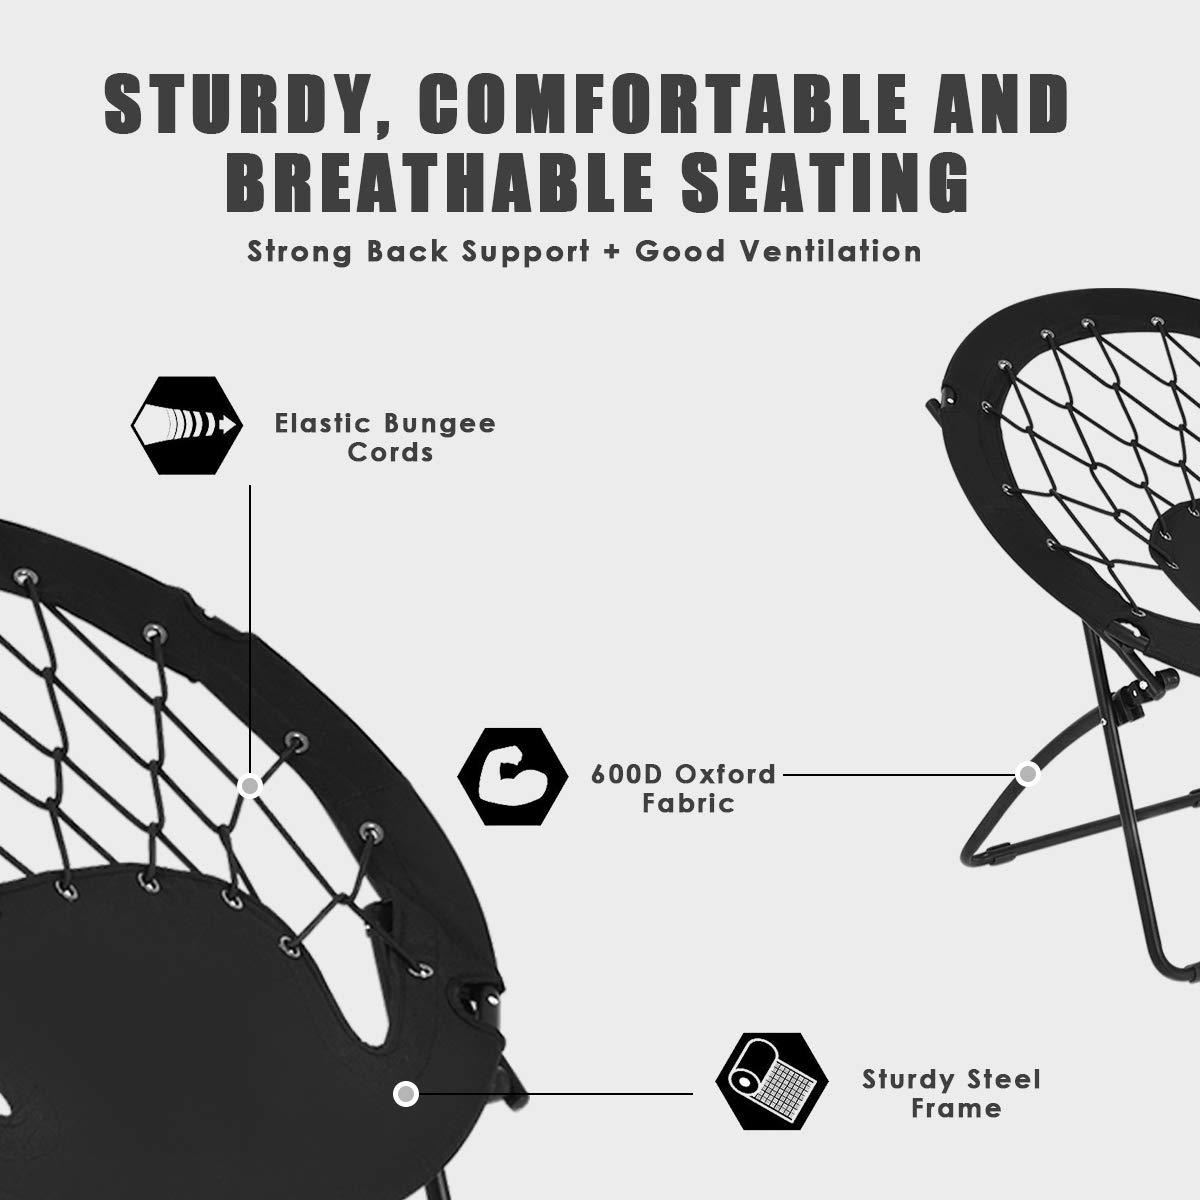 Goplus Bungee Chair Outdoor Camping Gaming Hiking Garden Patio Portable Steel Folding Bunjo Dish Chairs Autumn Brown